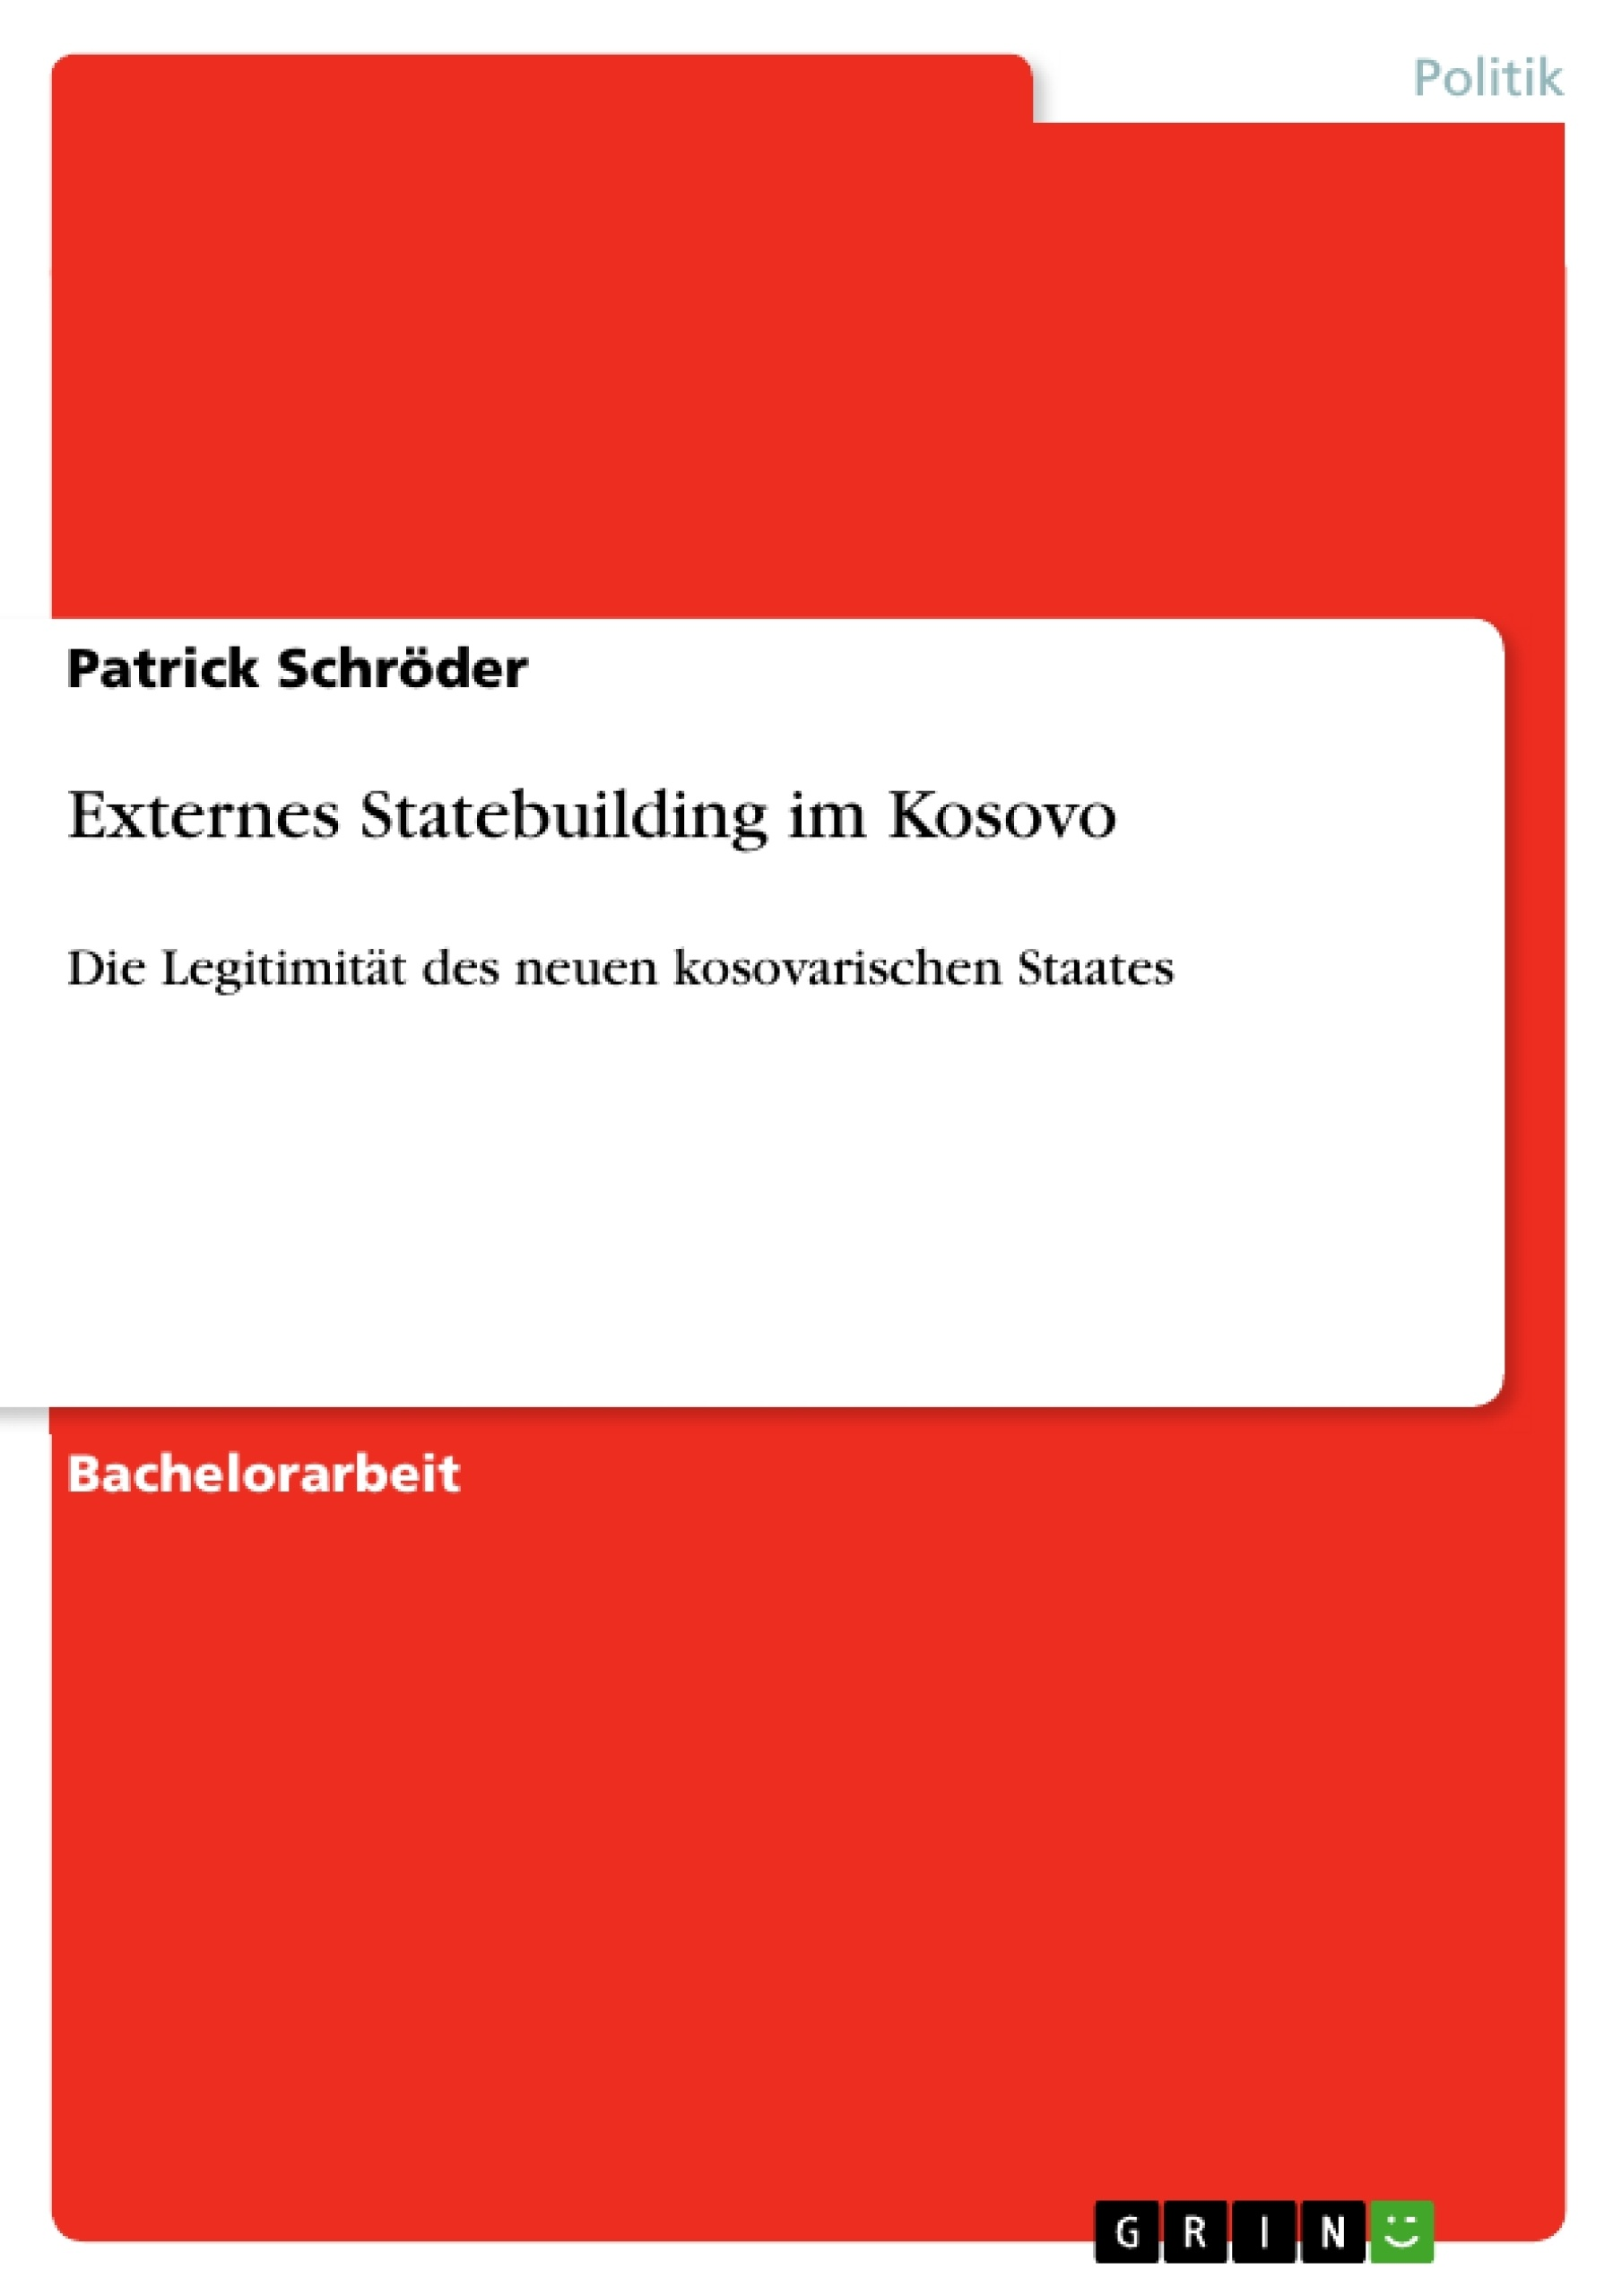 Titel: Externes Statebuilding im Kosovo